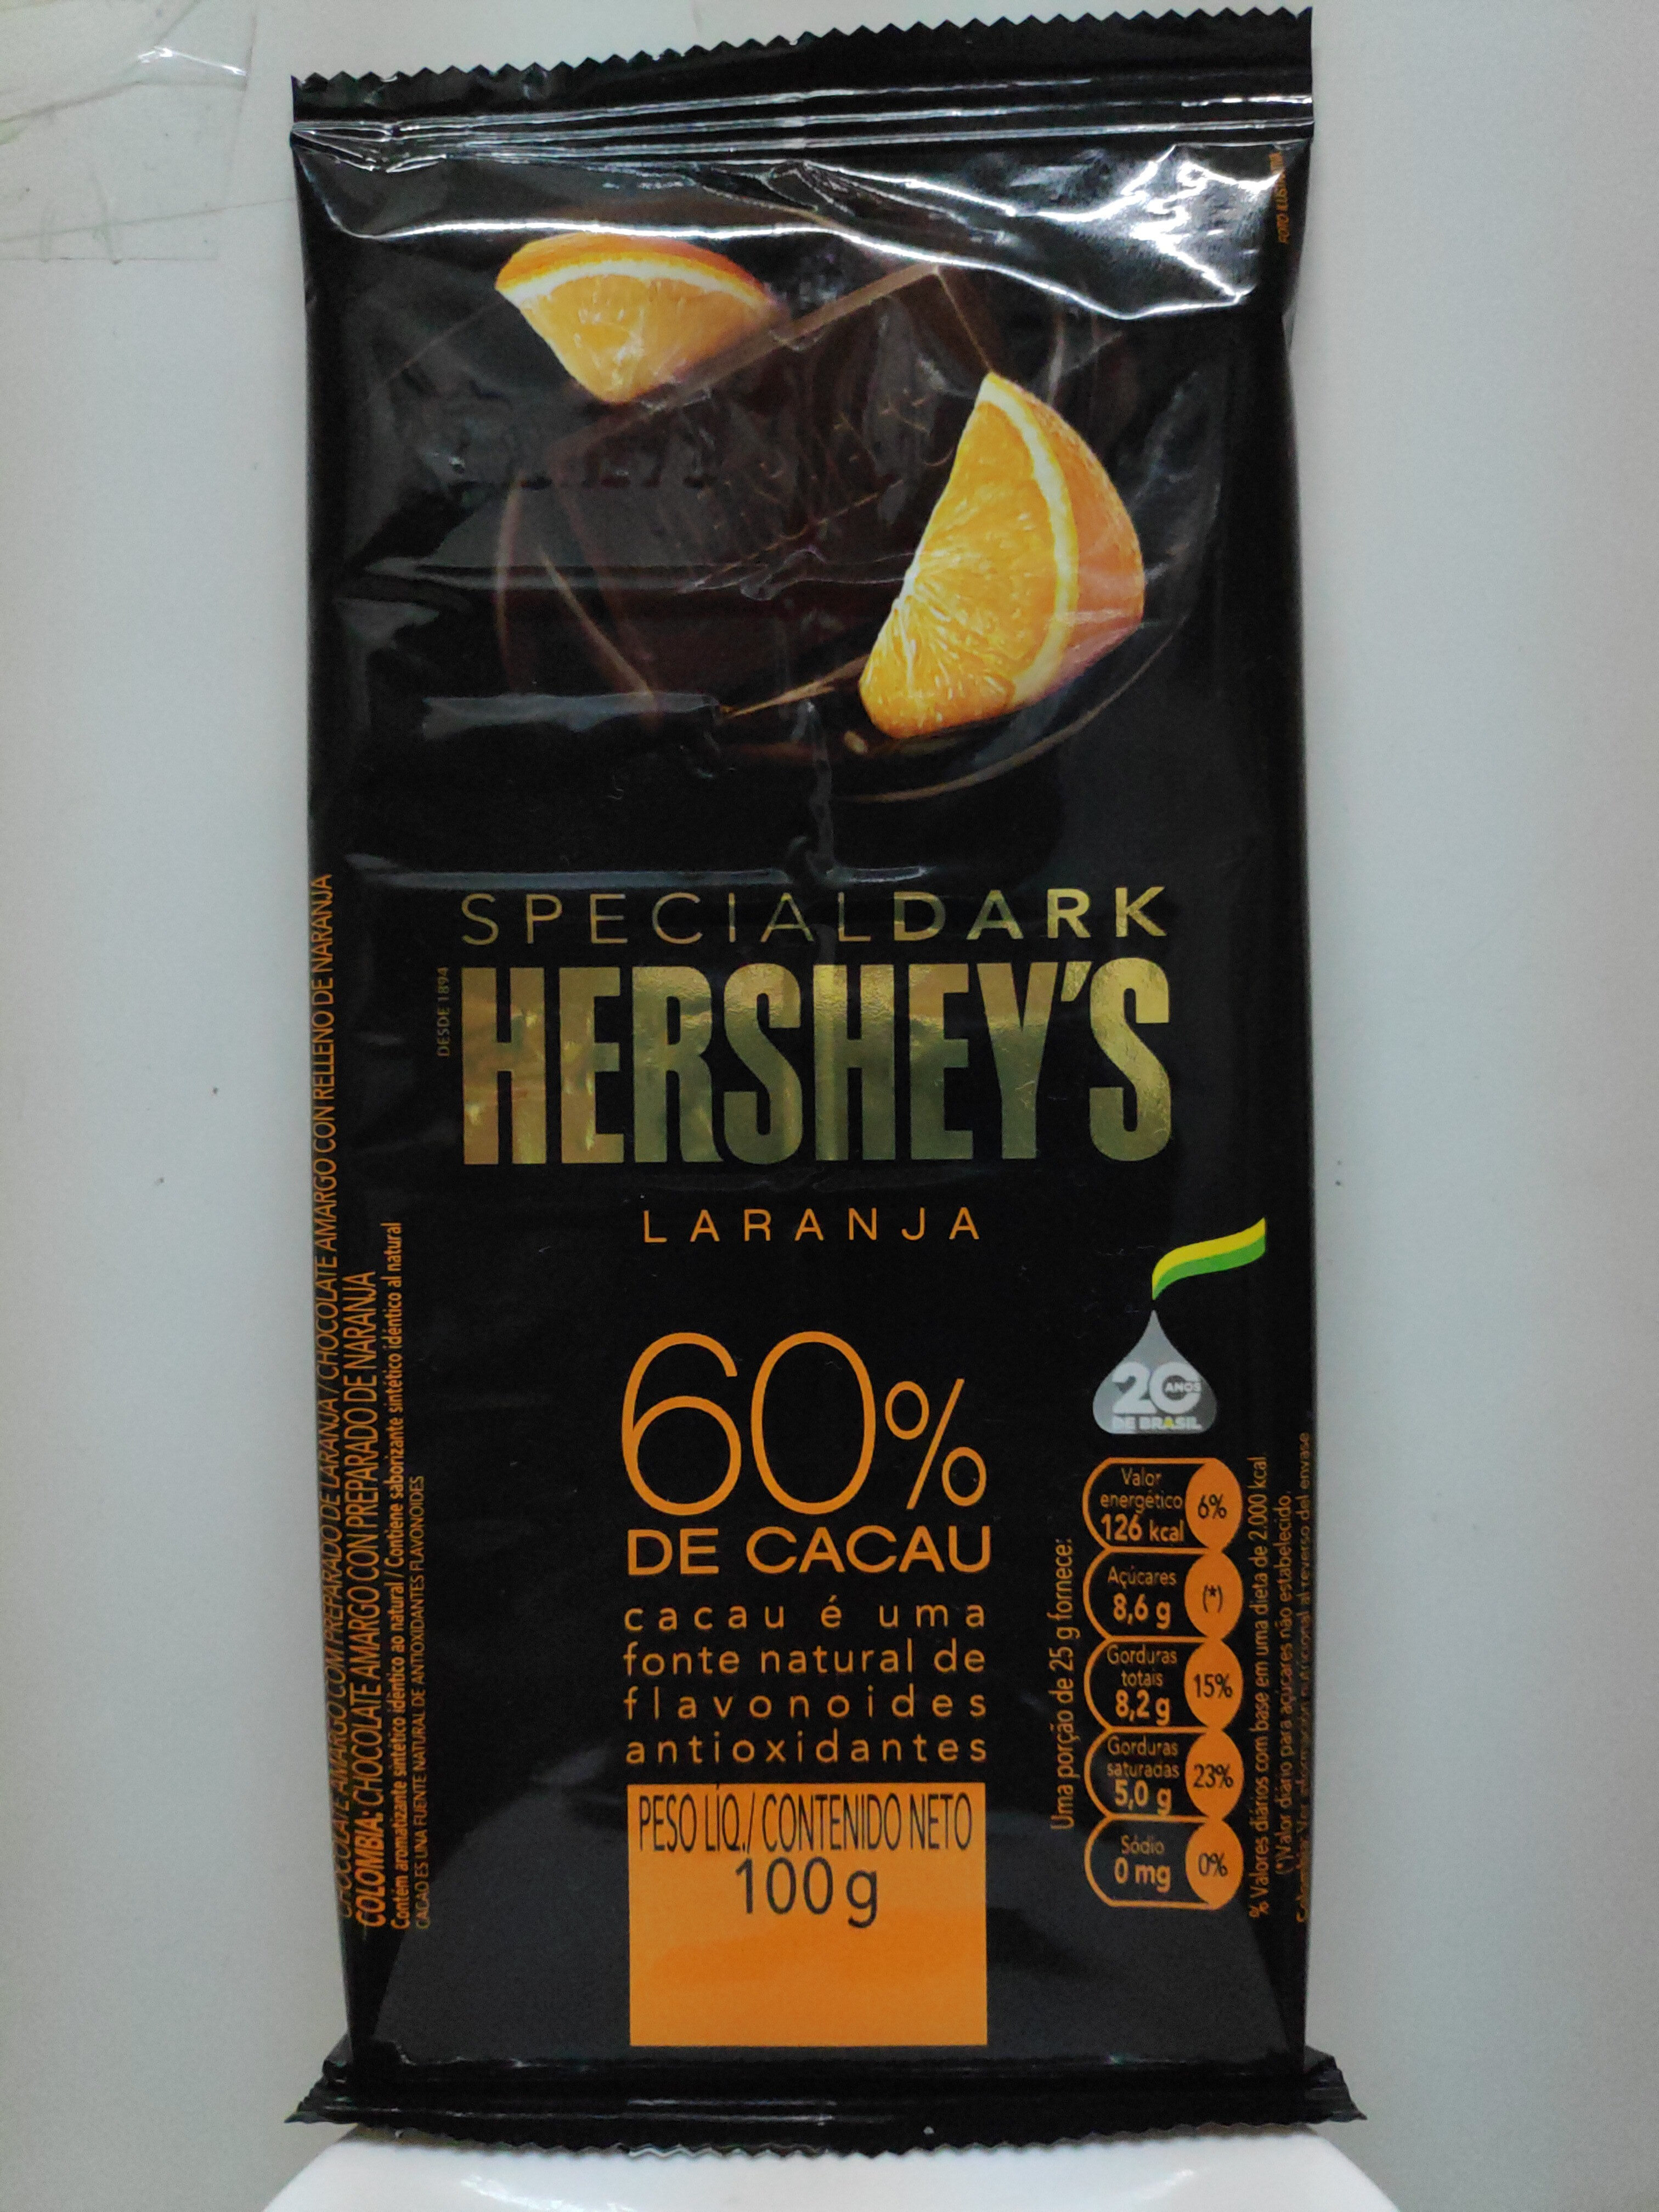 Special Dark Hershey's Laranja - Produto - pt